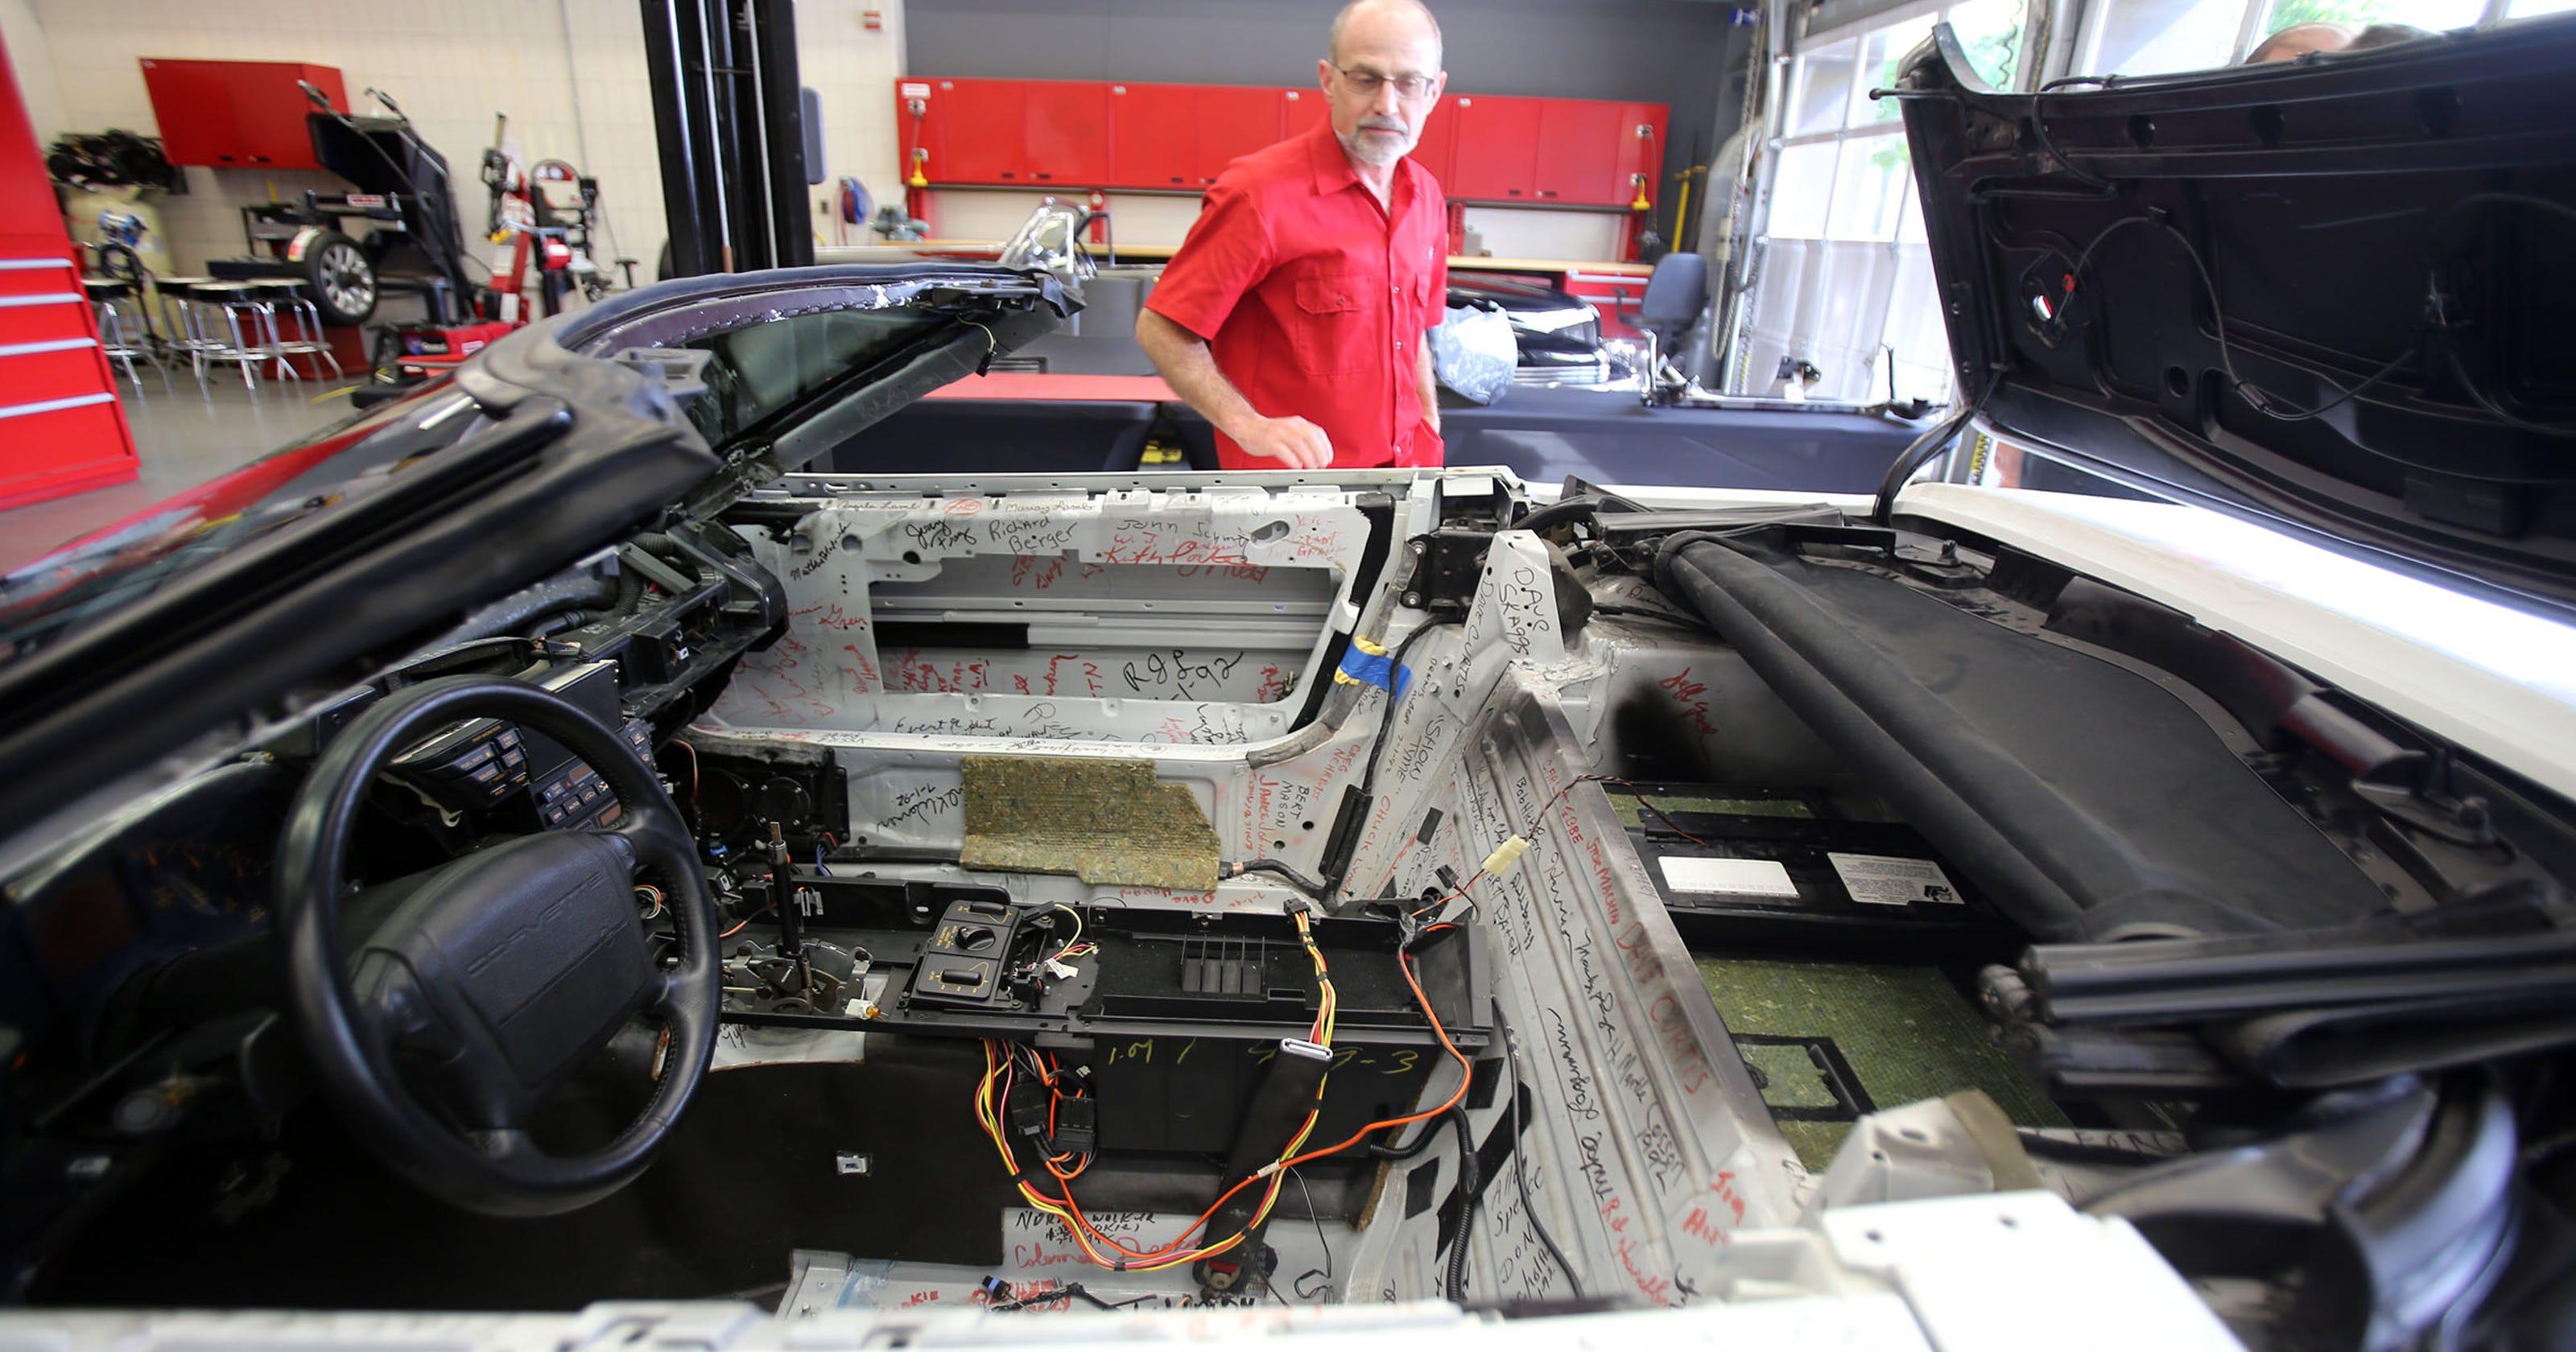 GM designers restore historic Corvette damaged in sinkhole